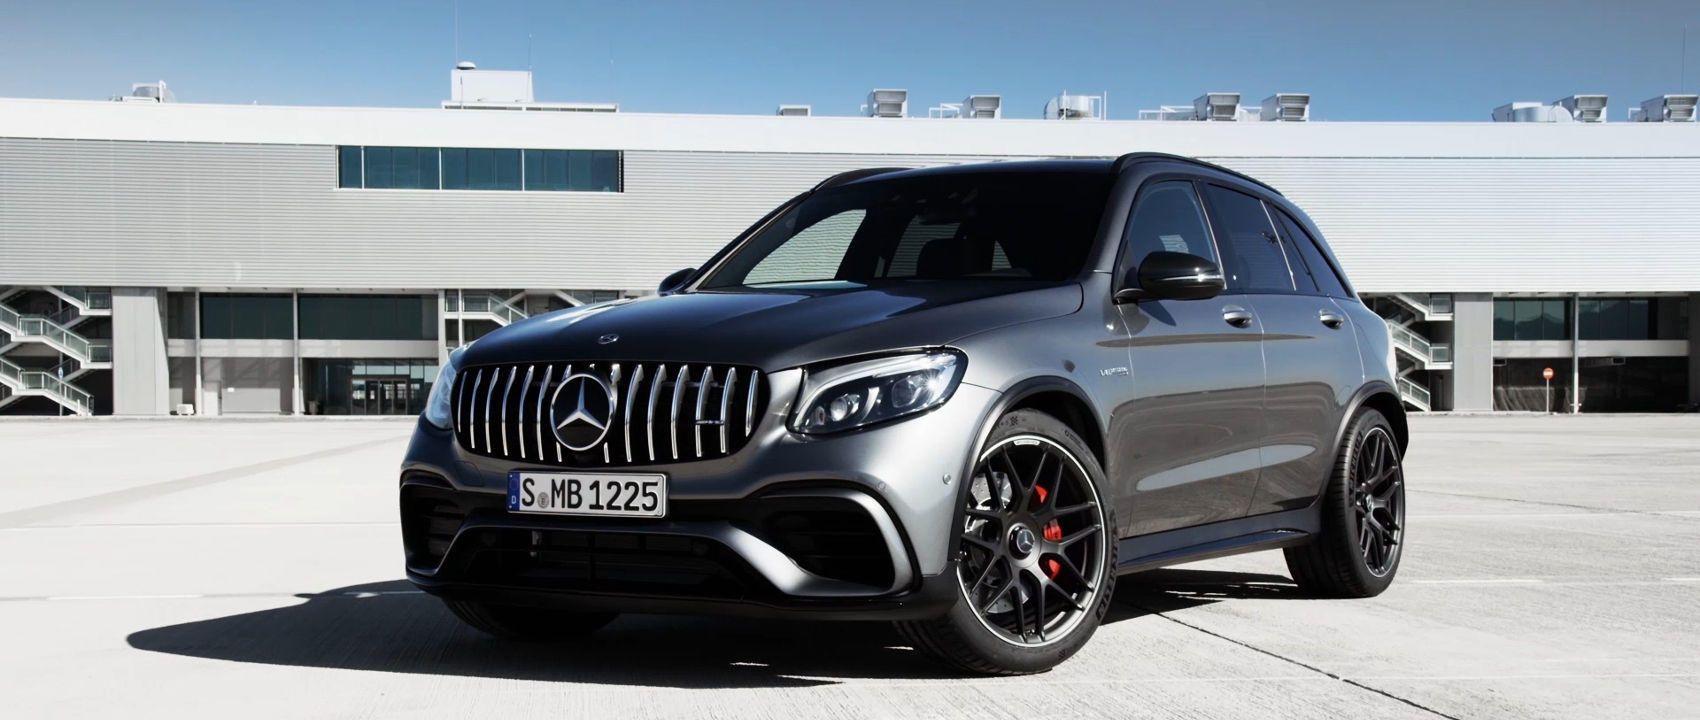 2018 Mercedes-Benz GLC: New AMG GLC63 Models, Price >> Mercedes Amg Glc 63 S 4matic Auto Mercedes Benz